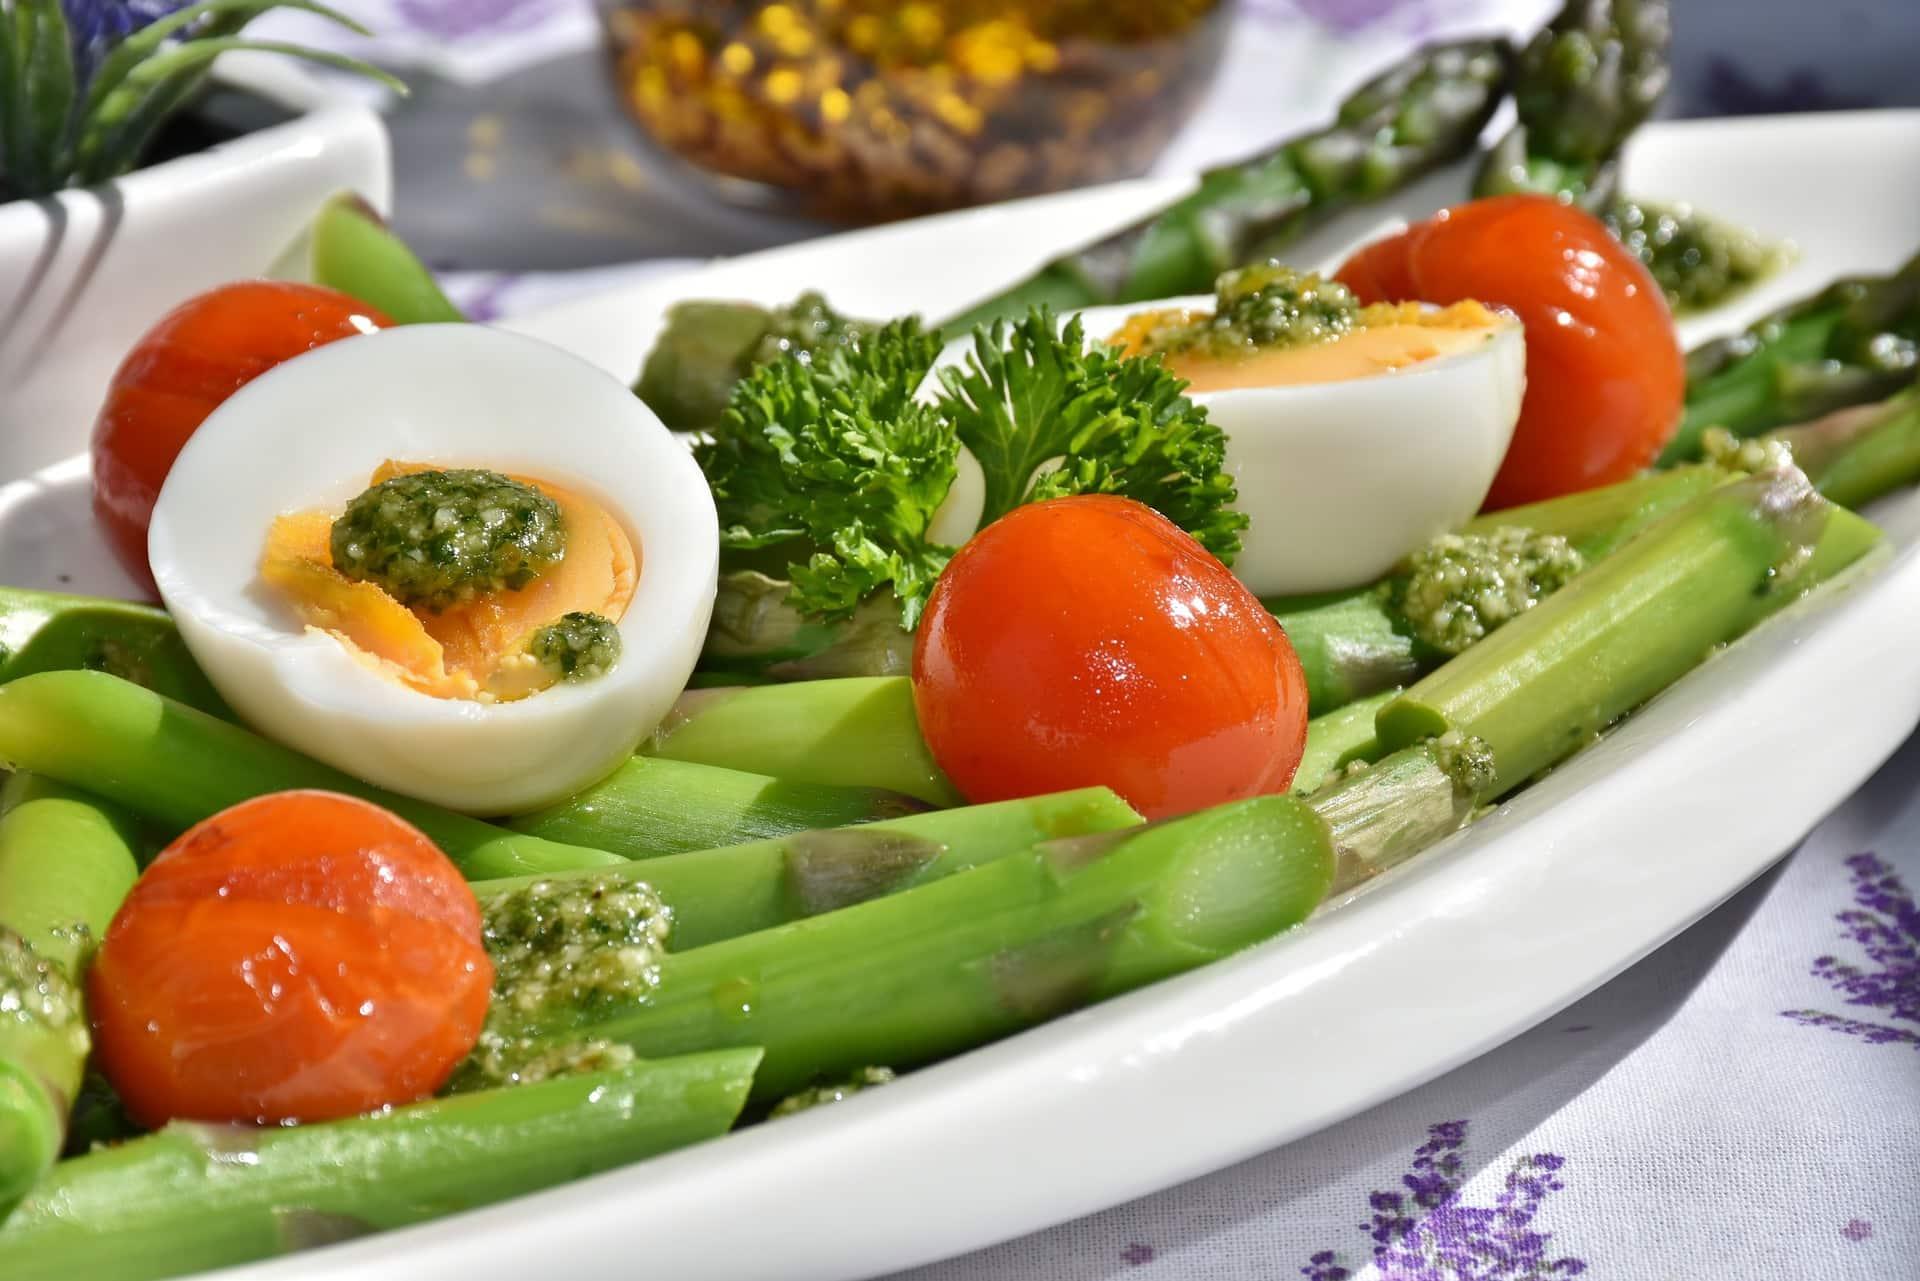 6 tolle Rezepte mit wenig Kohlenhydraten (#LowCarb)